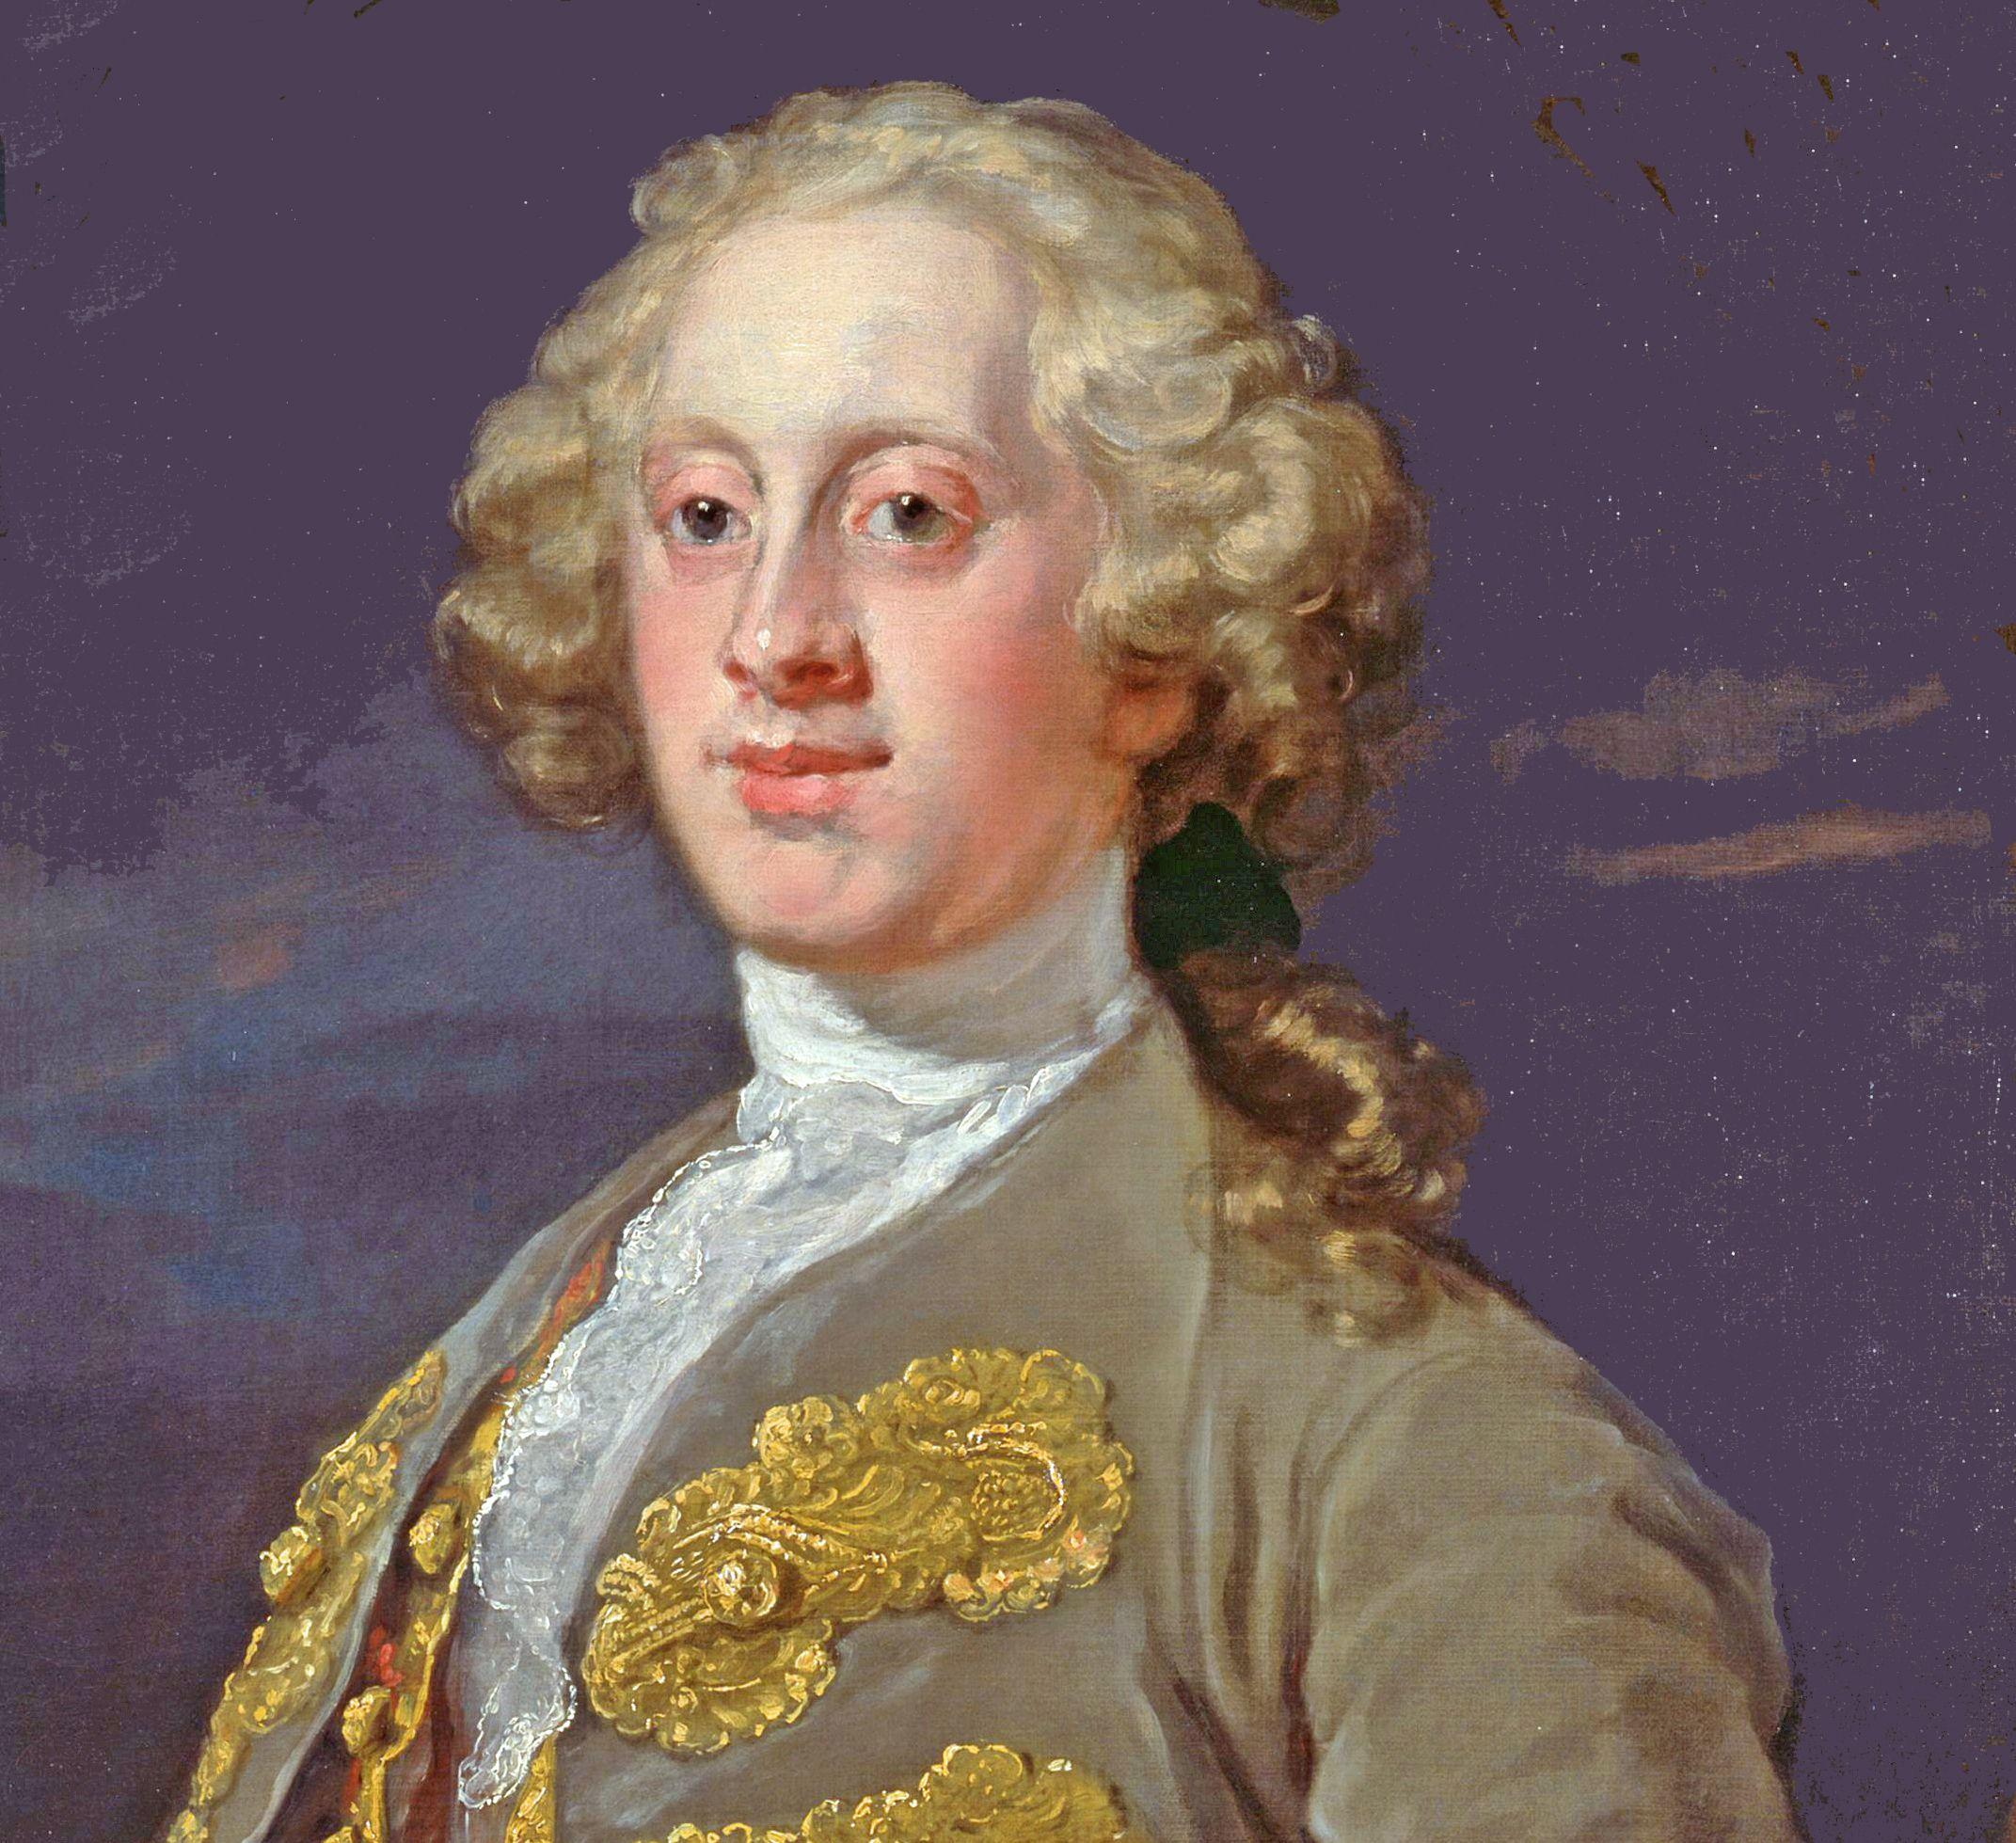 william cavendish, 4th duke of devonshire (1720 - 1764) held